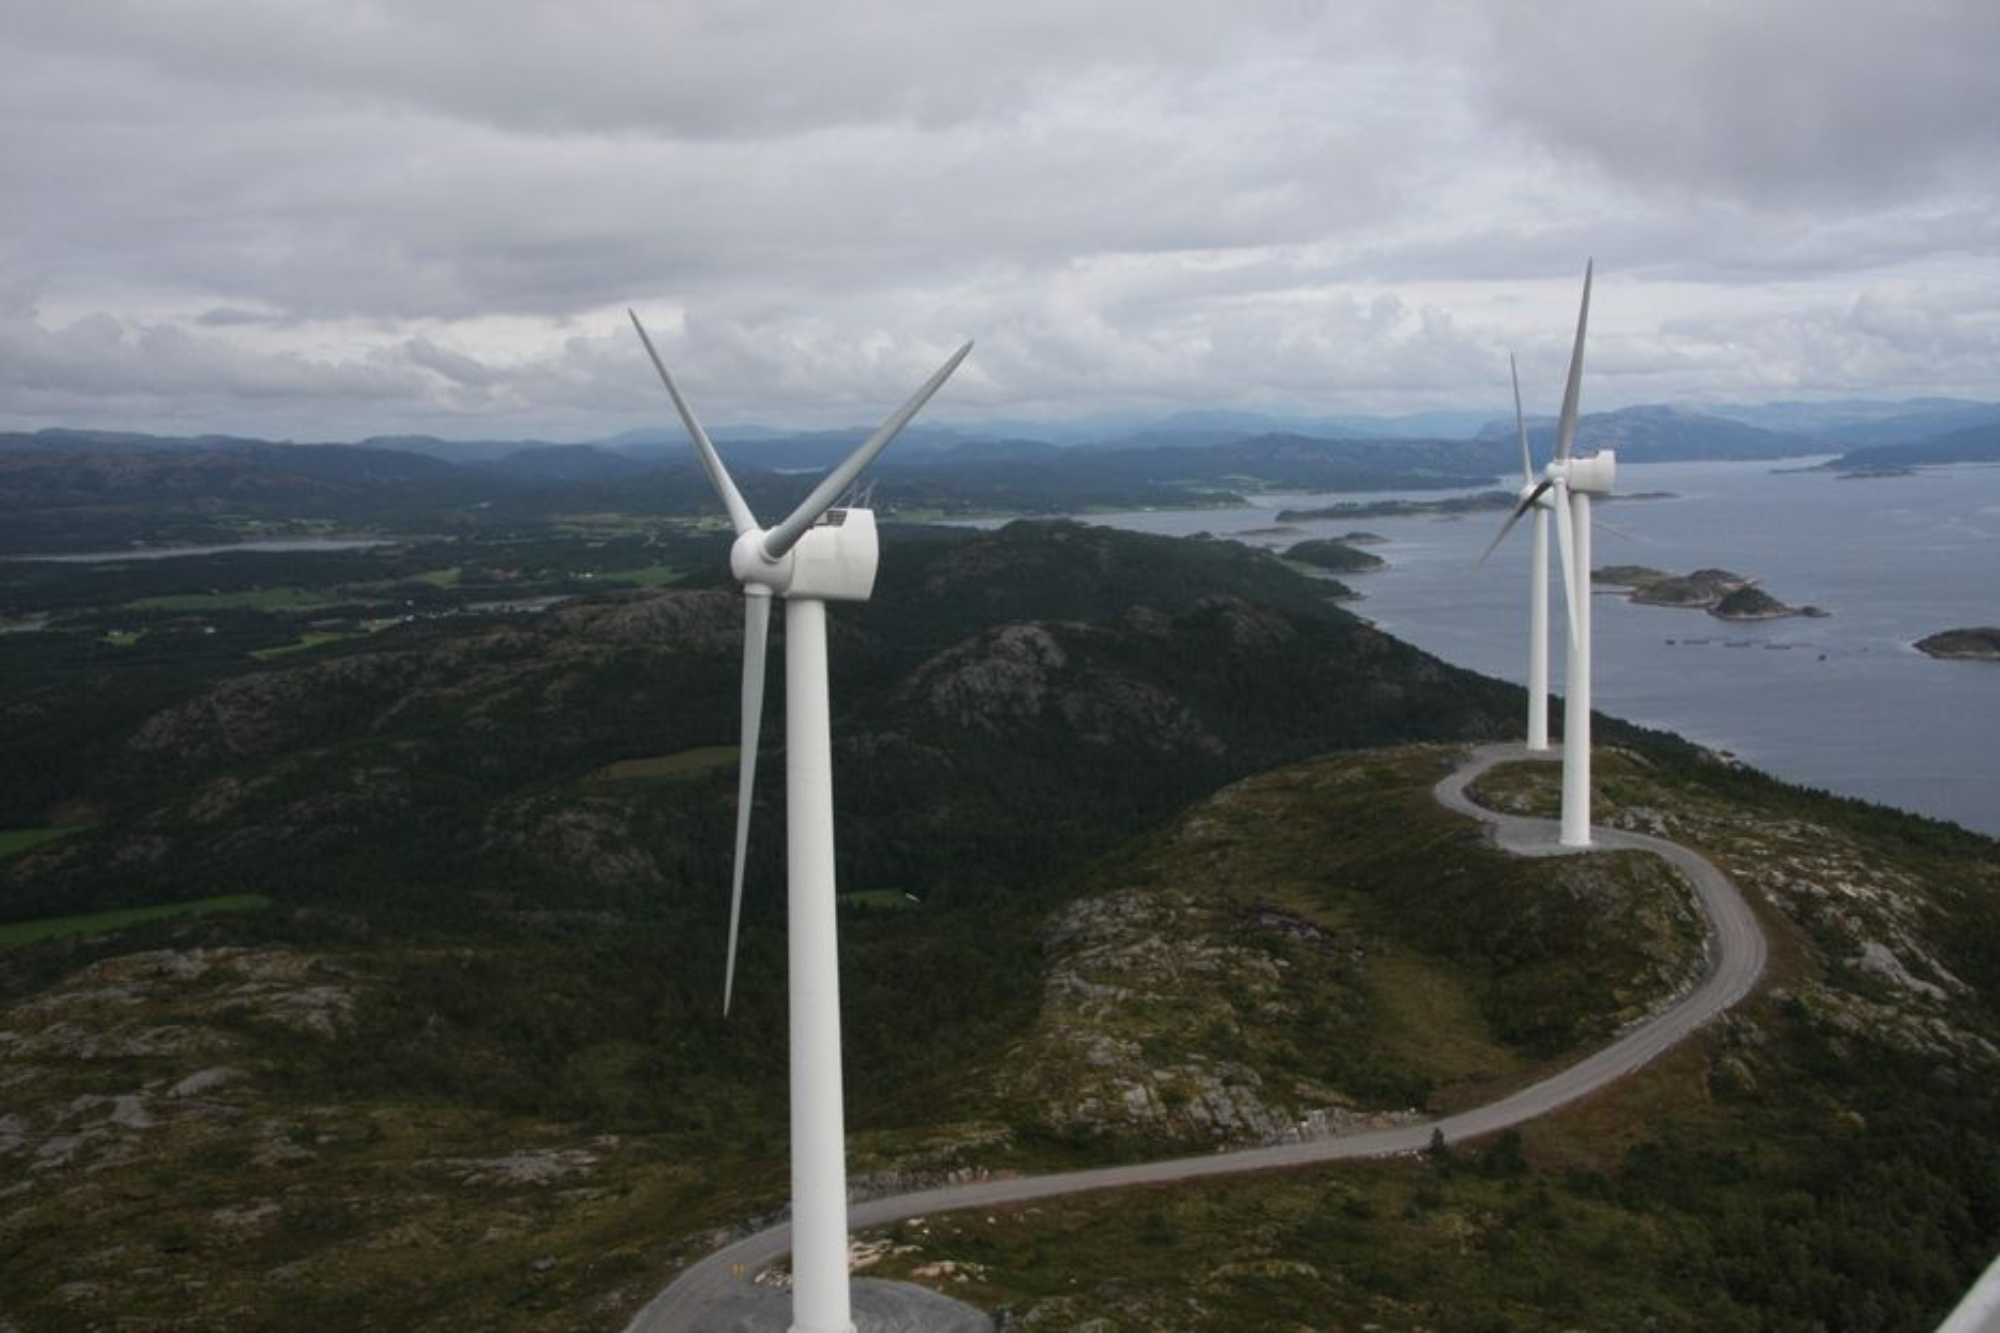 MILLIARDER: Fram mot 2020 skal GE investere 2,7 milliarder kroner i offshore vindkraft i Storbritannia, Tyskland, Sverige og Norge.